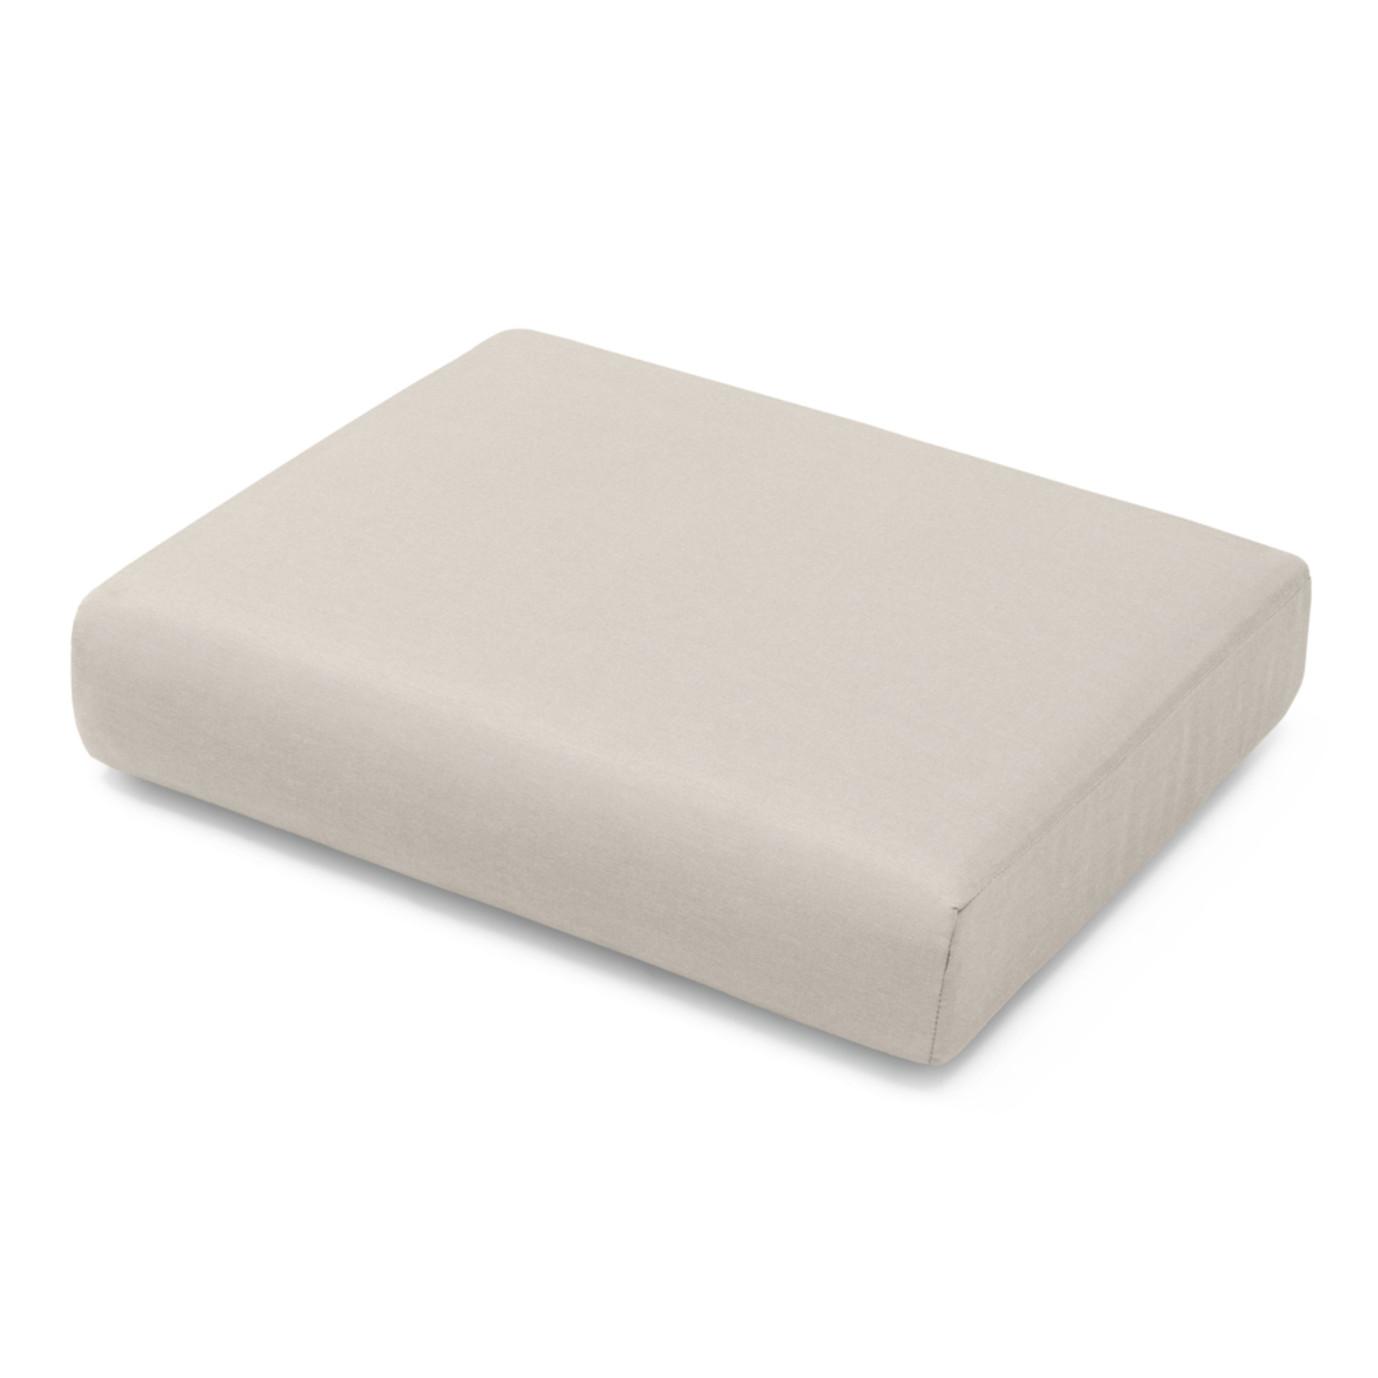 Portofino Comfort Club Ottoman Cushion - Taupe Mist